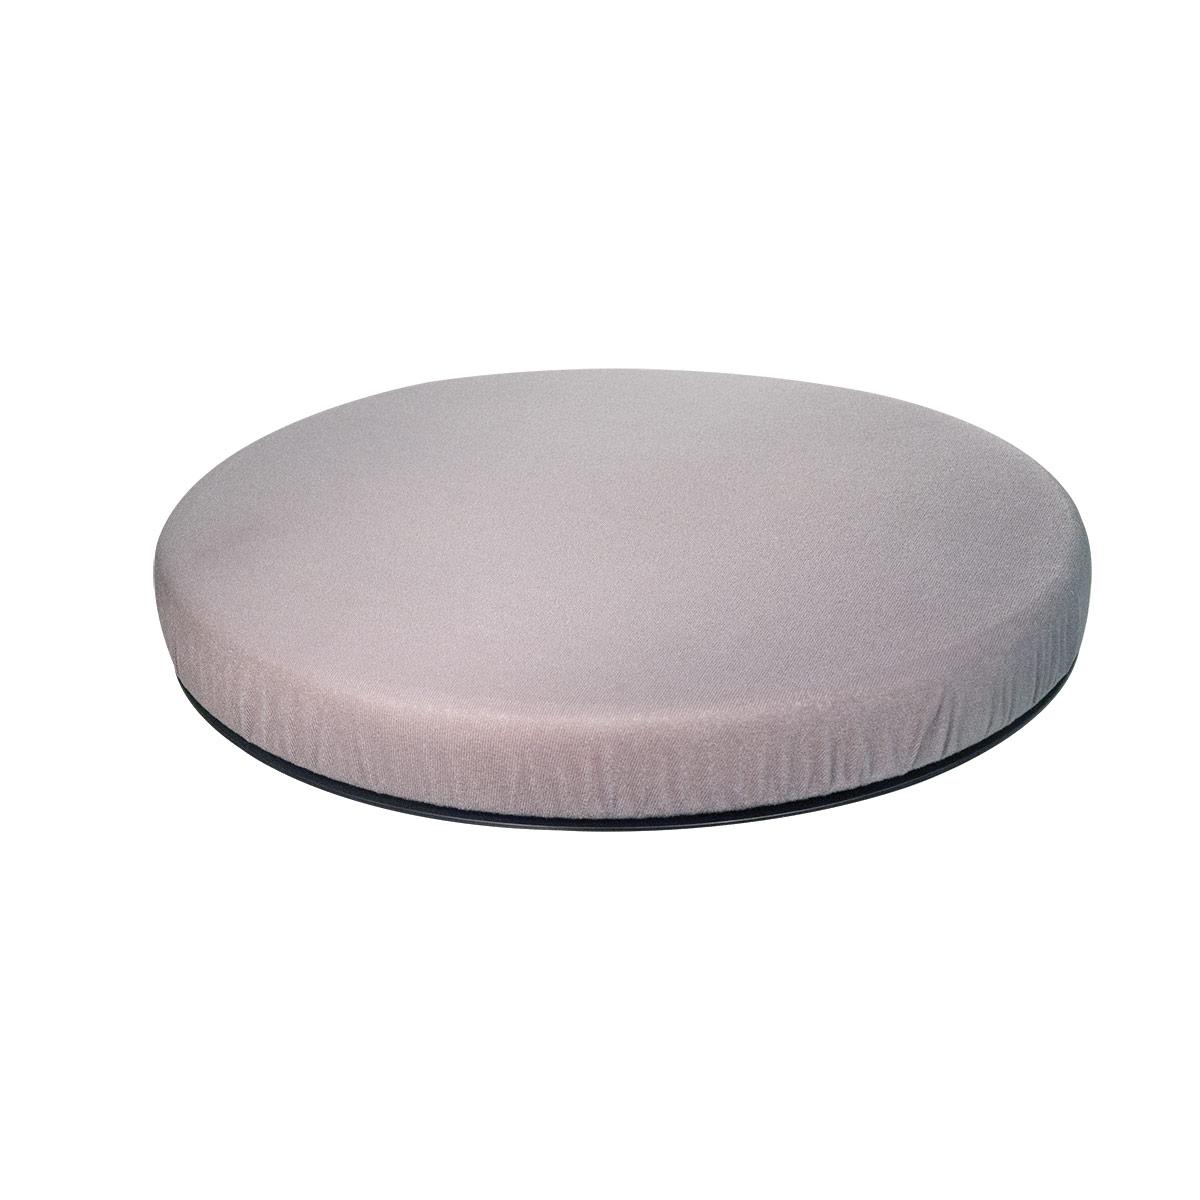 Swivel Seat Cushion - Gray